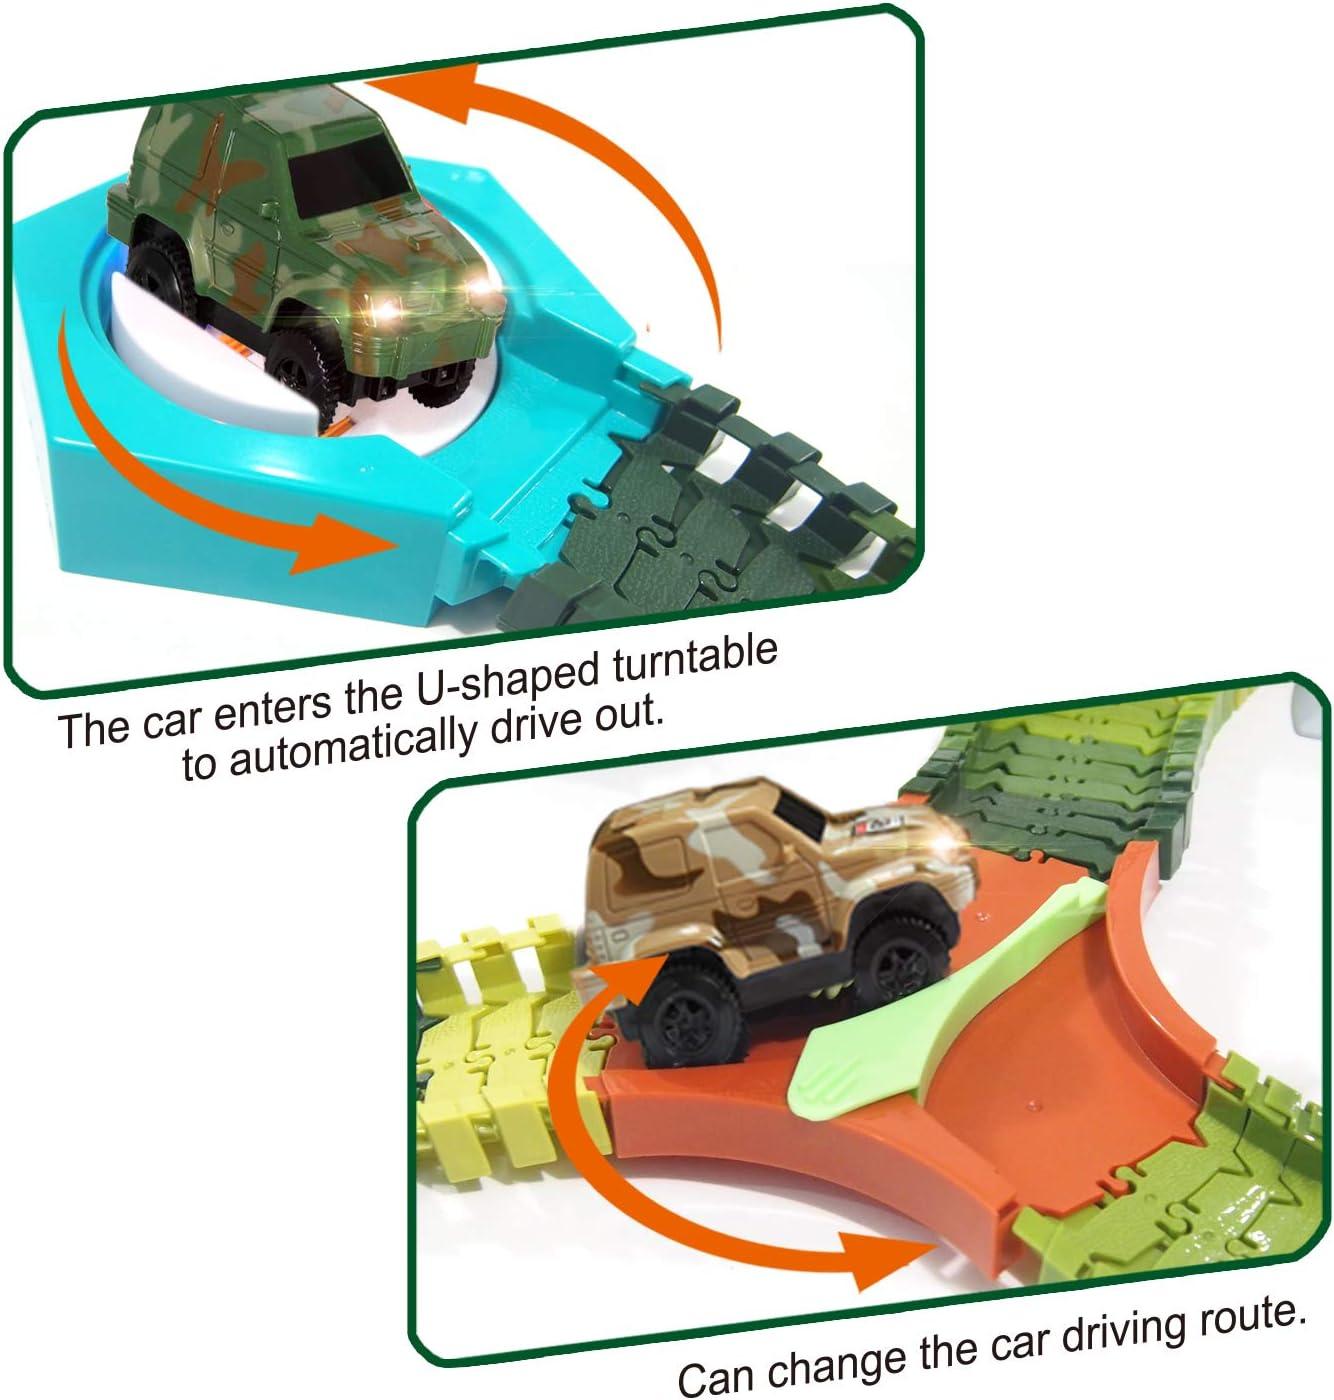 Amazon.com: HOMOFY Dinosaur Juguetes Race Car Flexible Track ...